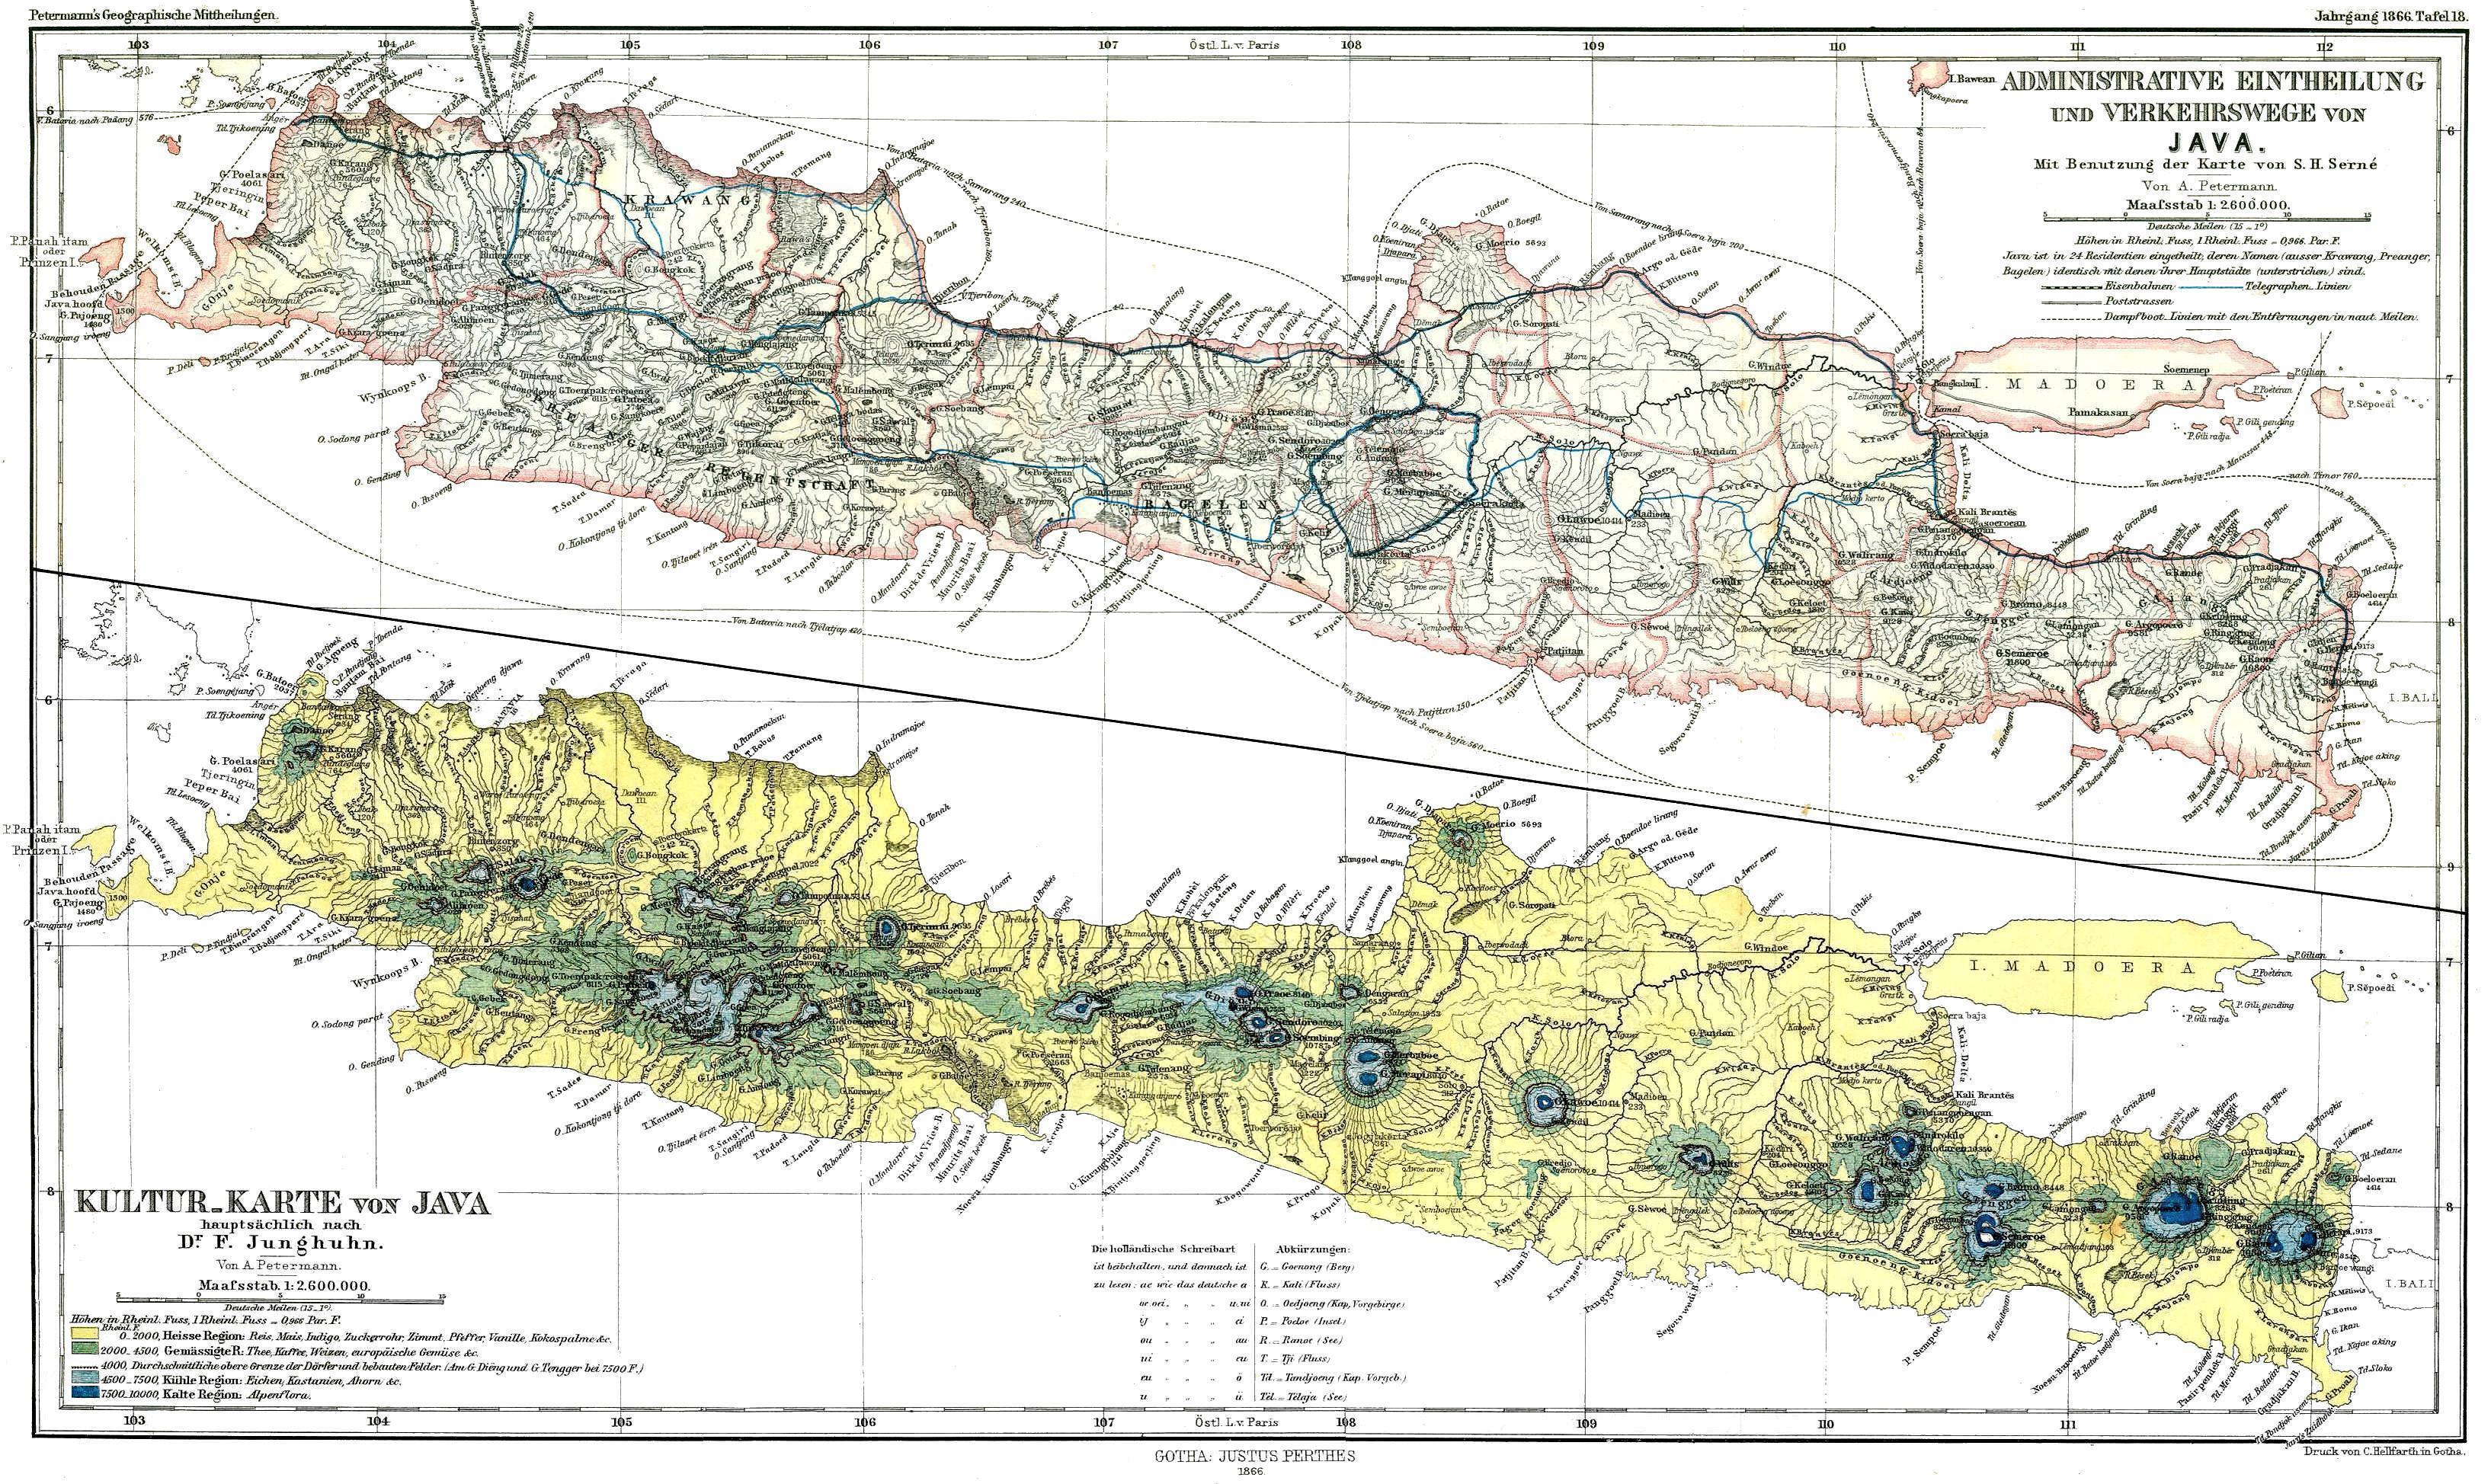 File:Junghuhns Kultur-Karte von Java.jpg - Wikimedia Commons